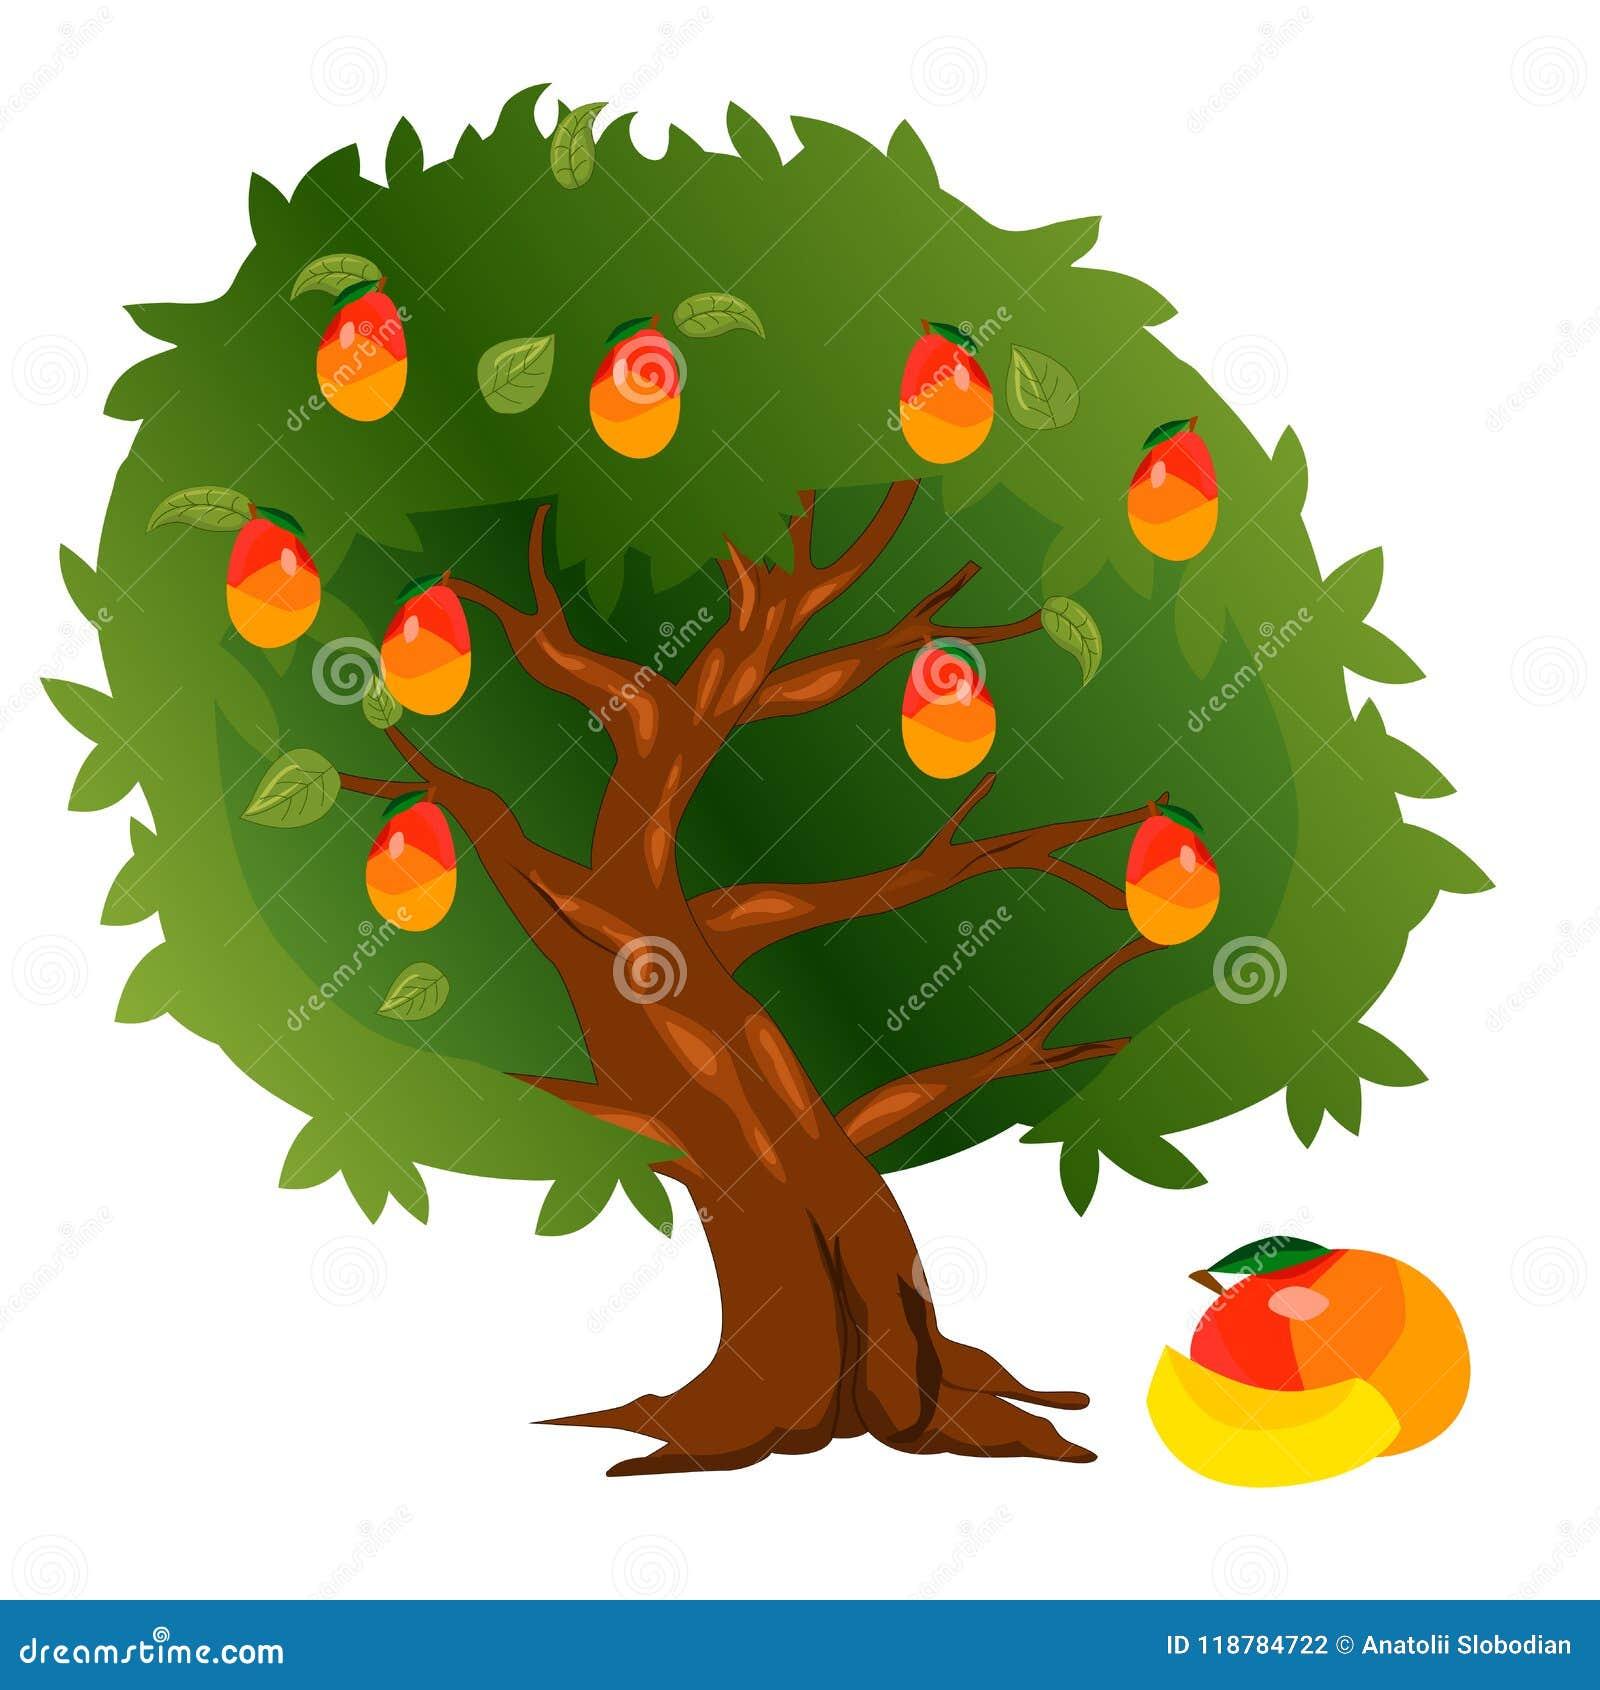 Mango Tree Stock Illustrations 4 202 Mango Tree Stock Illustrations Vectors Clipart Dreamstime Mechanic toy cartoon mango tree. https www dreamstime com mango tree fruits green leaves mango tree fruits green leaves image118784722